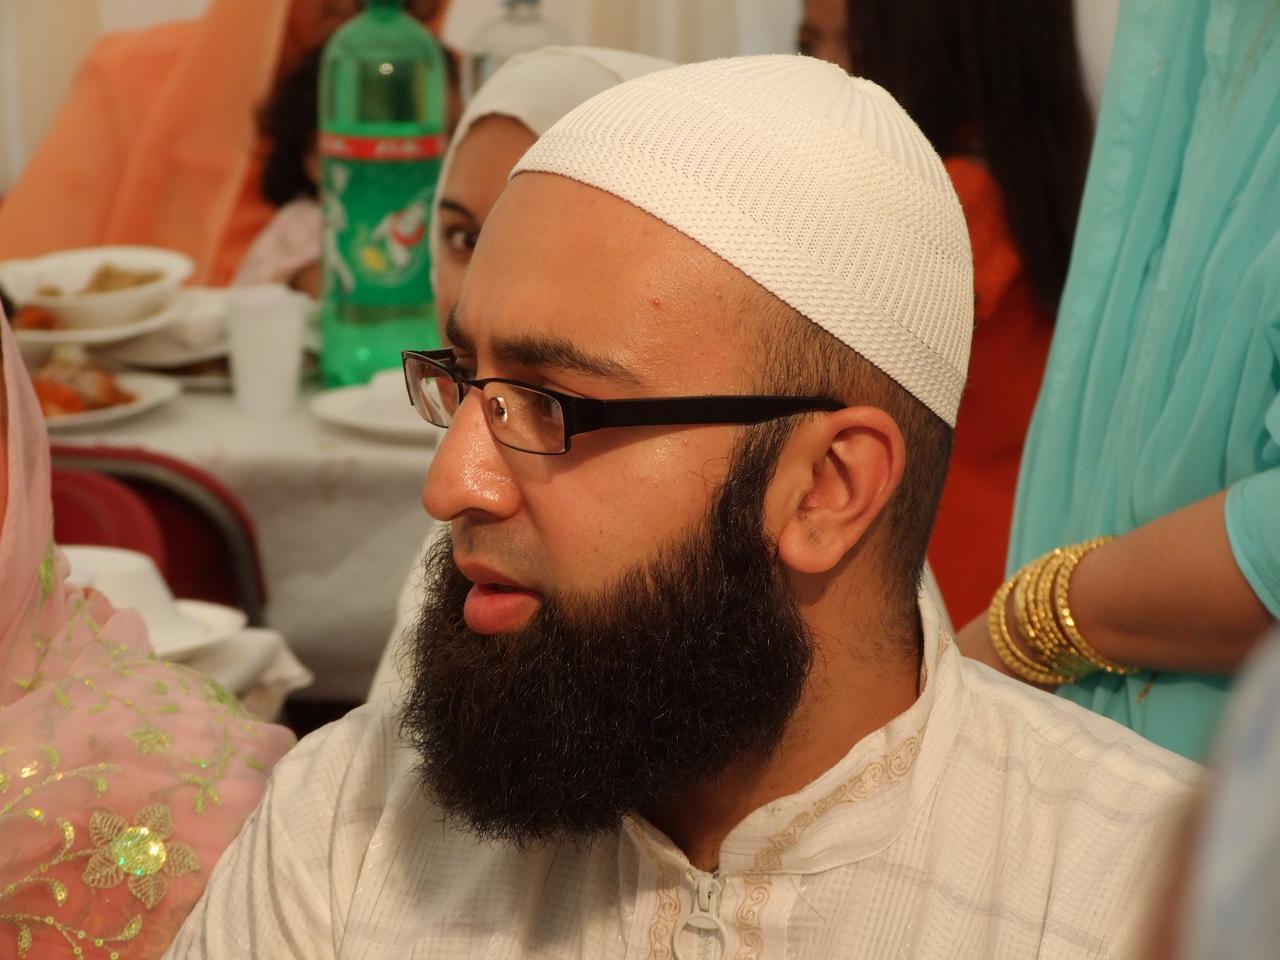 crocker muslim 8 rows category selected: cake mix halal status product name ups code betty crocker,store: 2016 muslim consumer group.